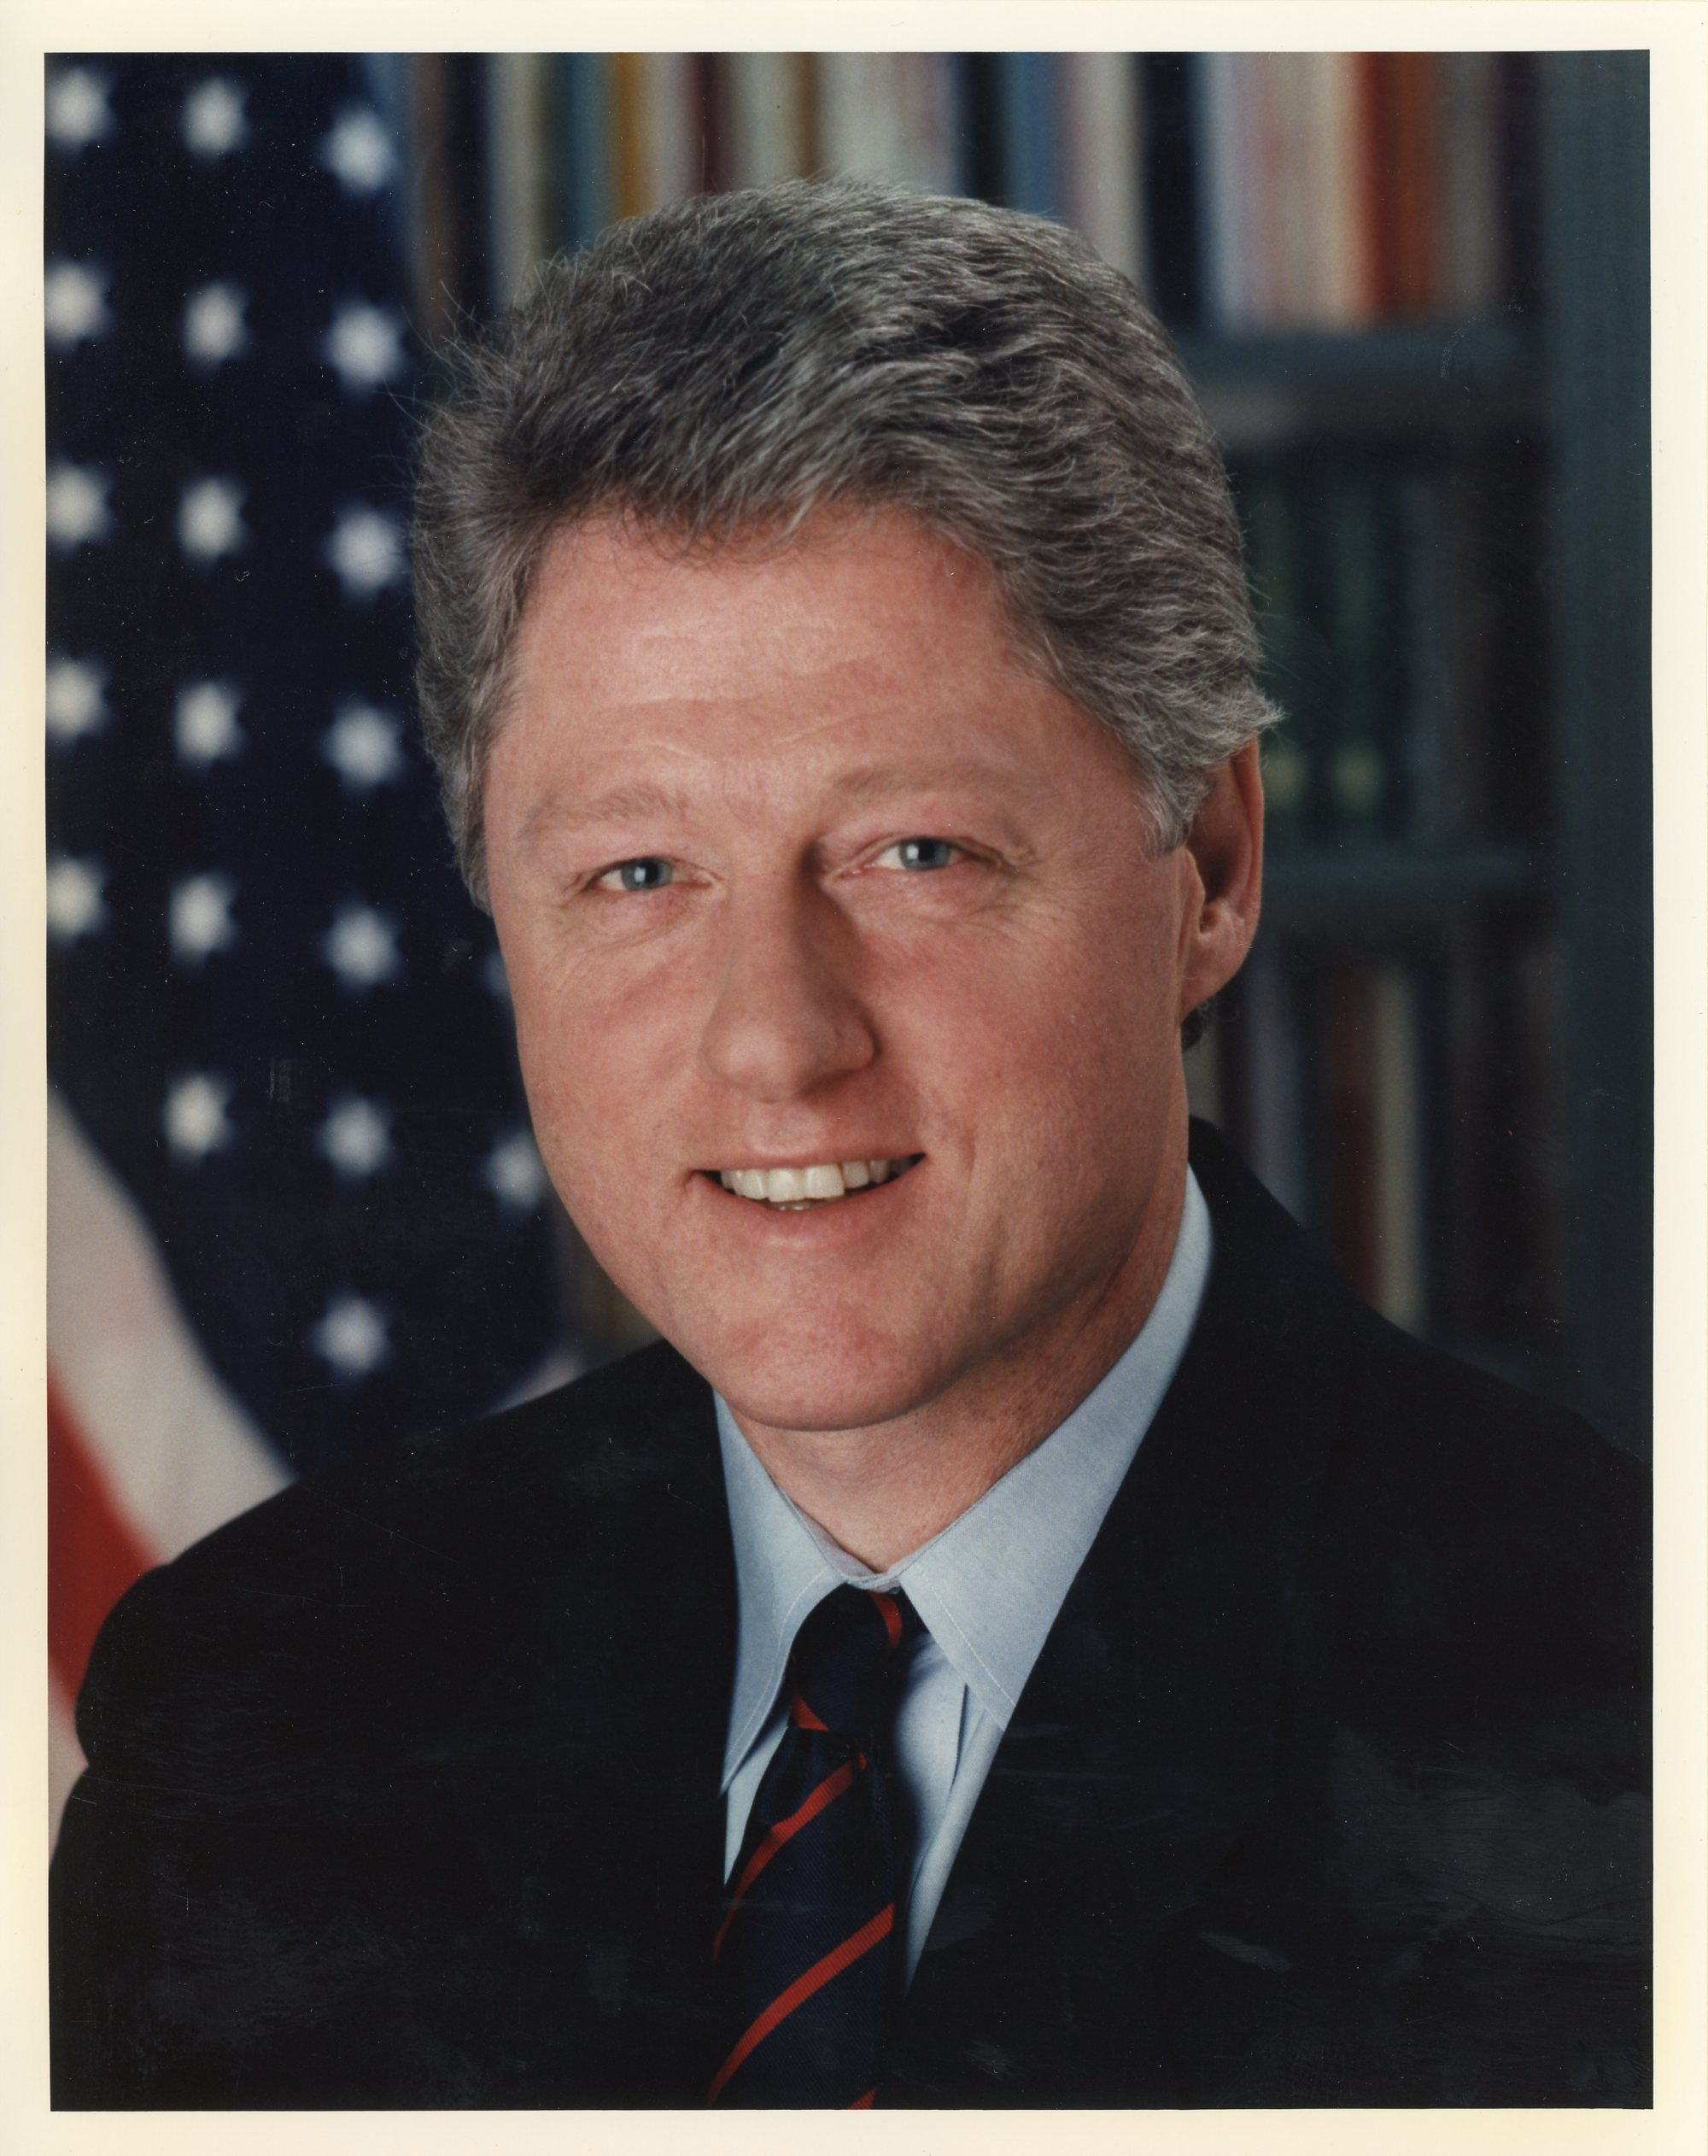 bill clinton - photo #38